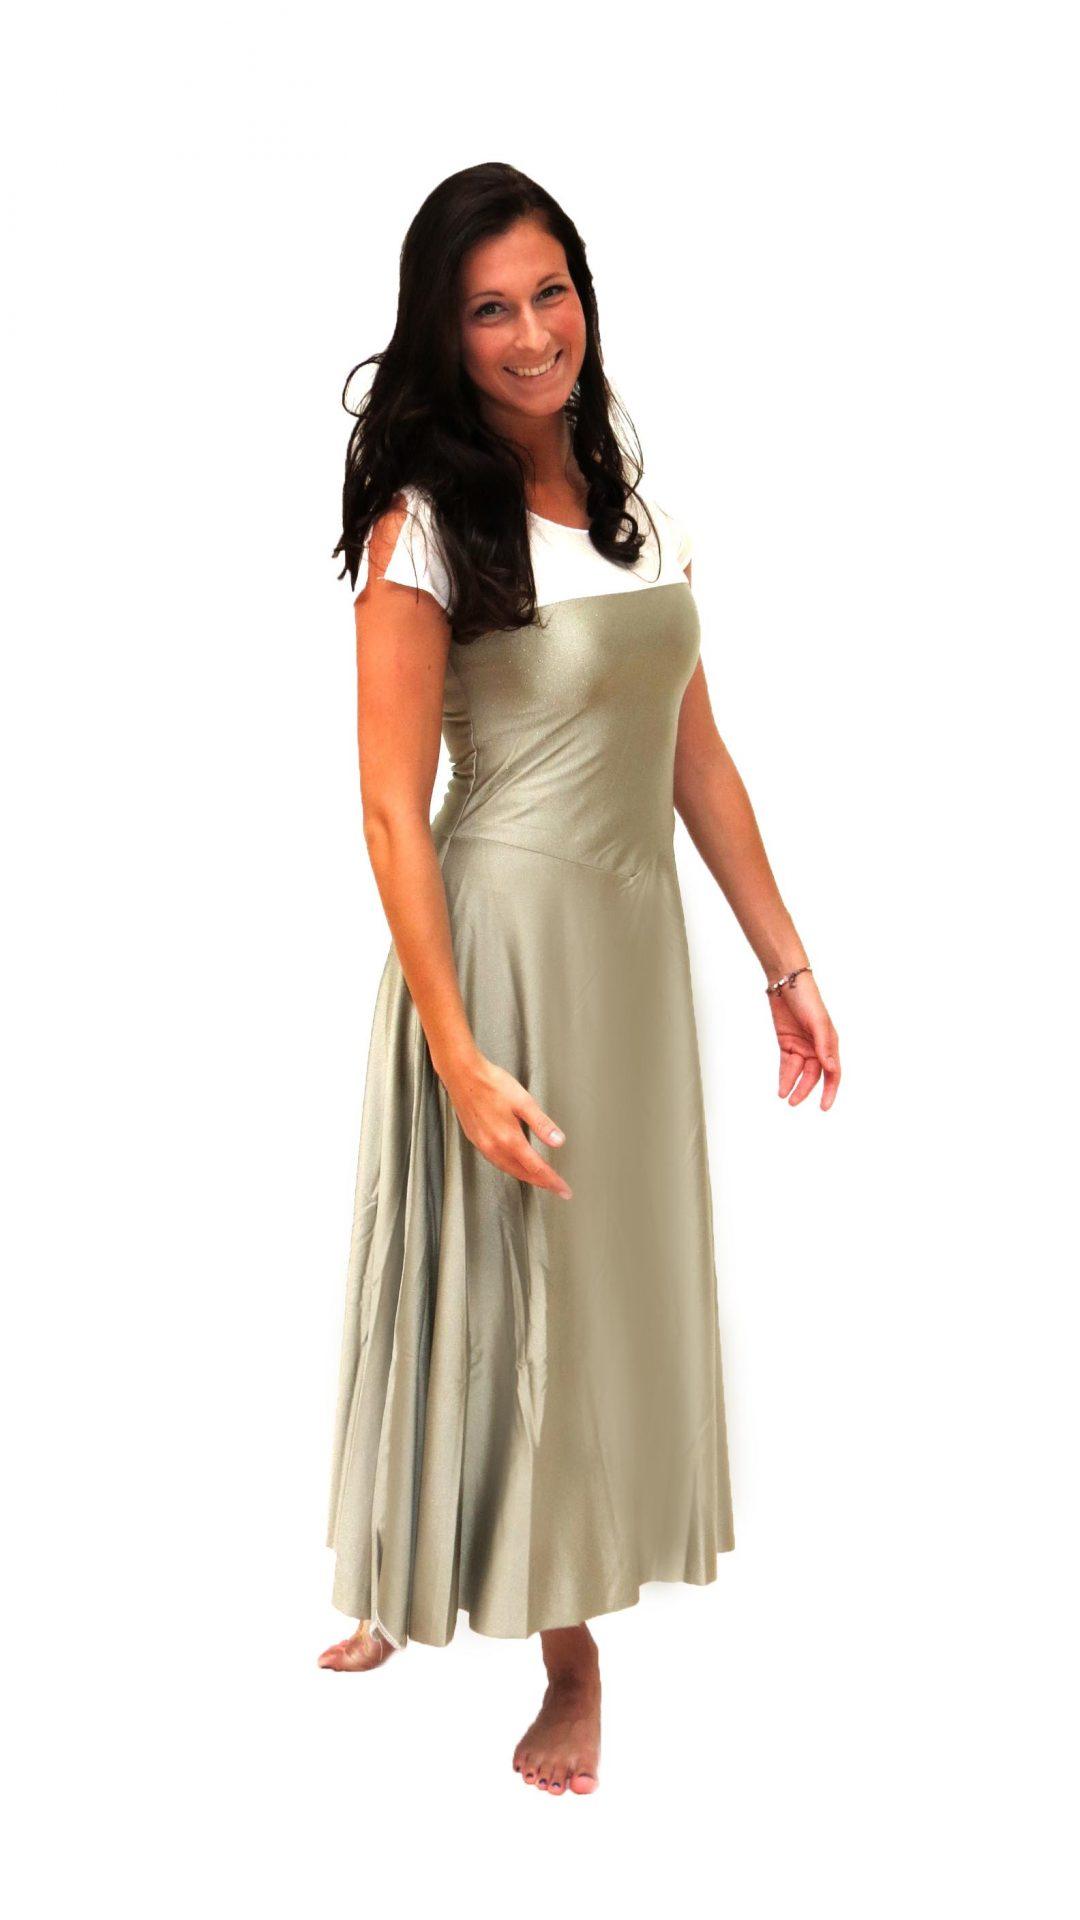 Welp Lycra jurk goud met wit incl. bruine bolero - Ghislaine Dance Company ZS-28